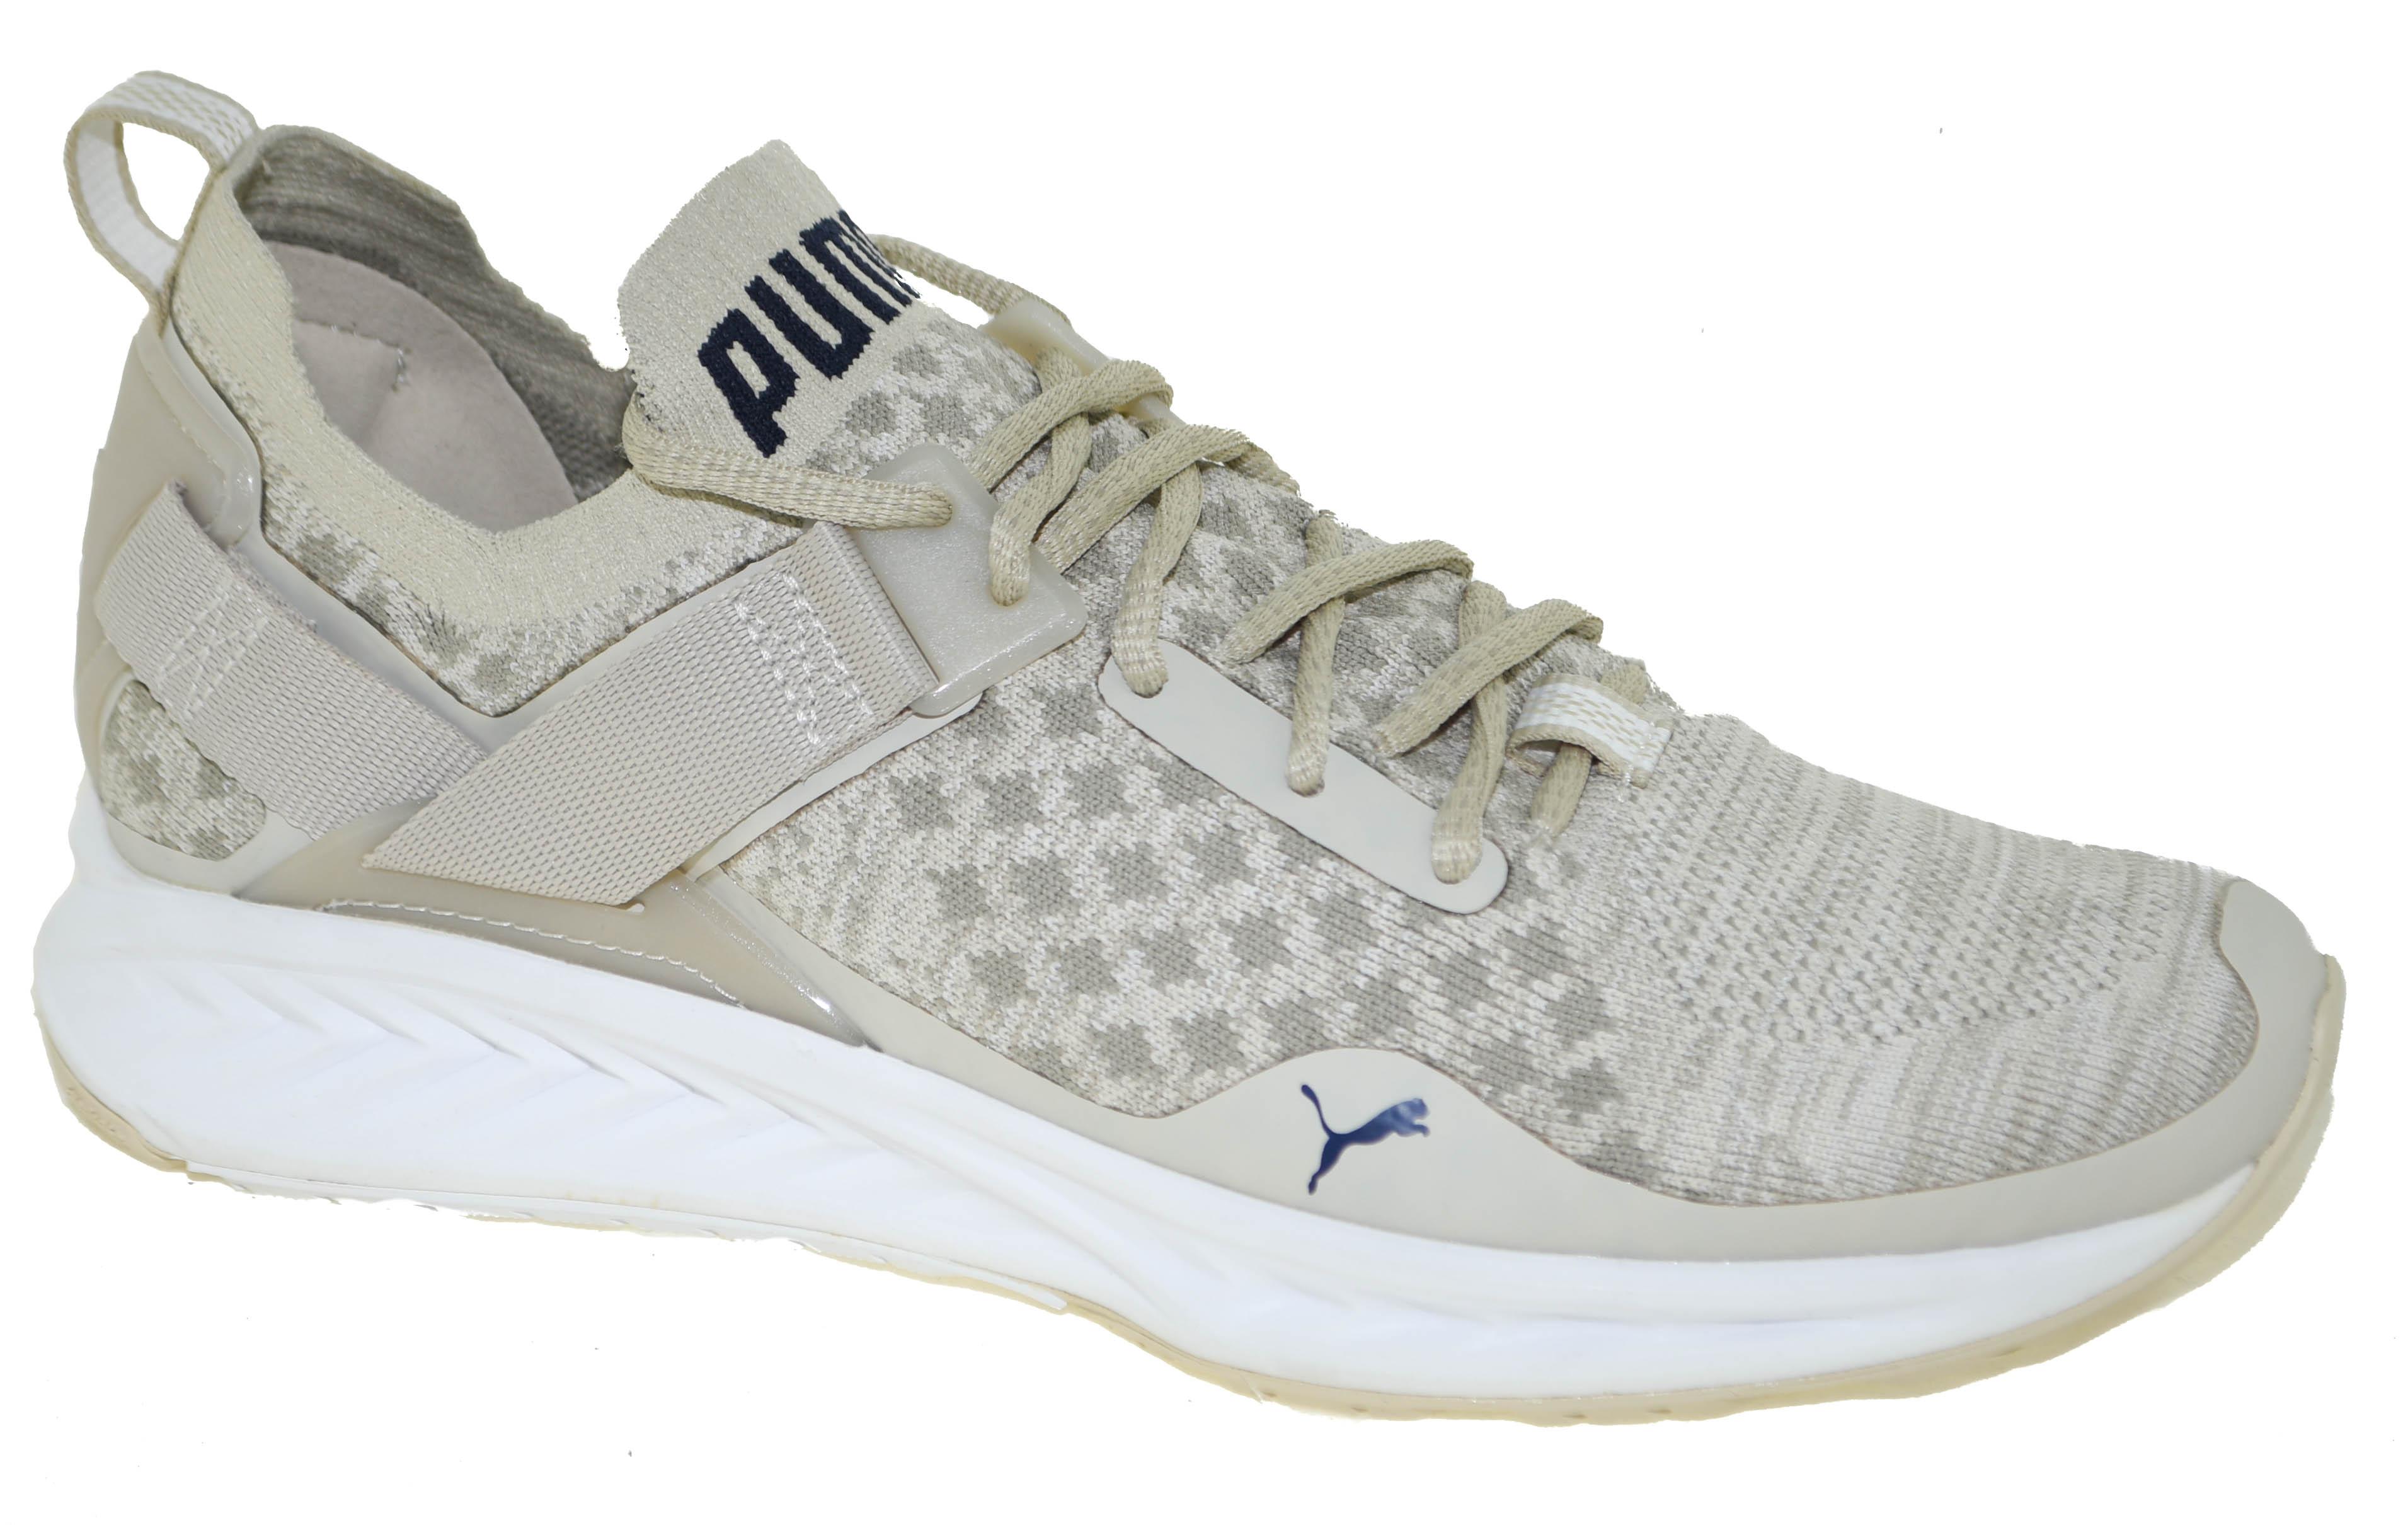 Puma Men s Ignite EVOKnit Training Shoes Khaki Style 189926-02  8b0fe09aa